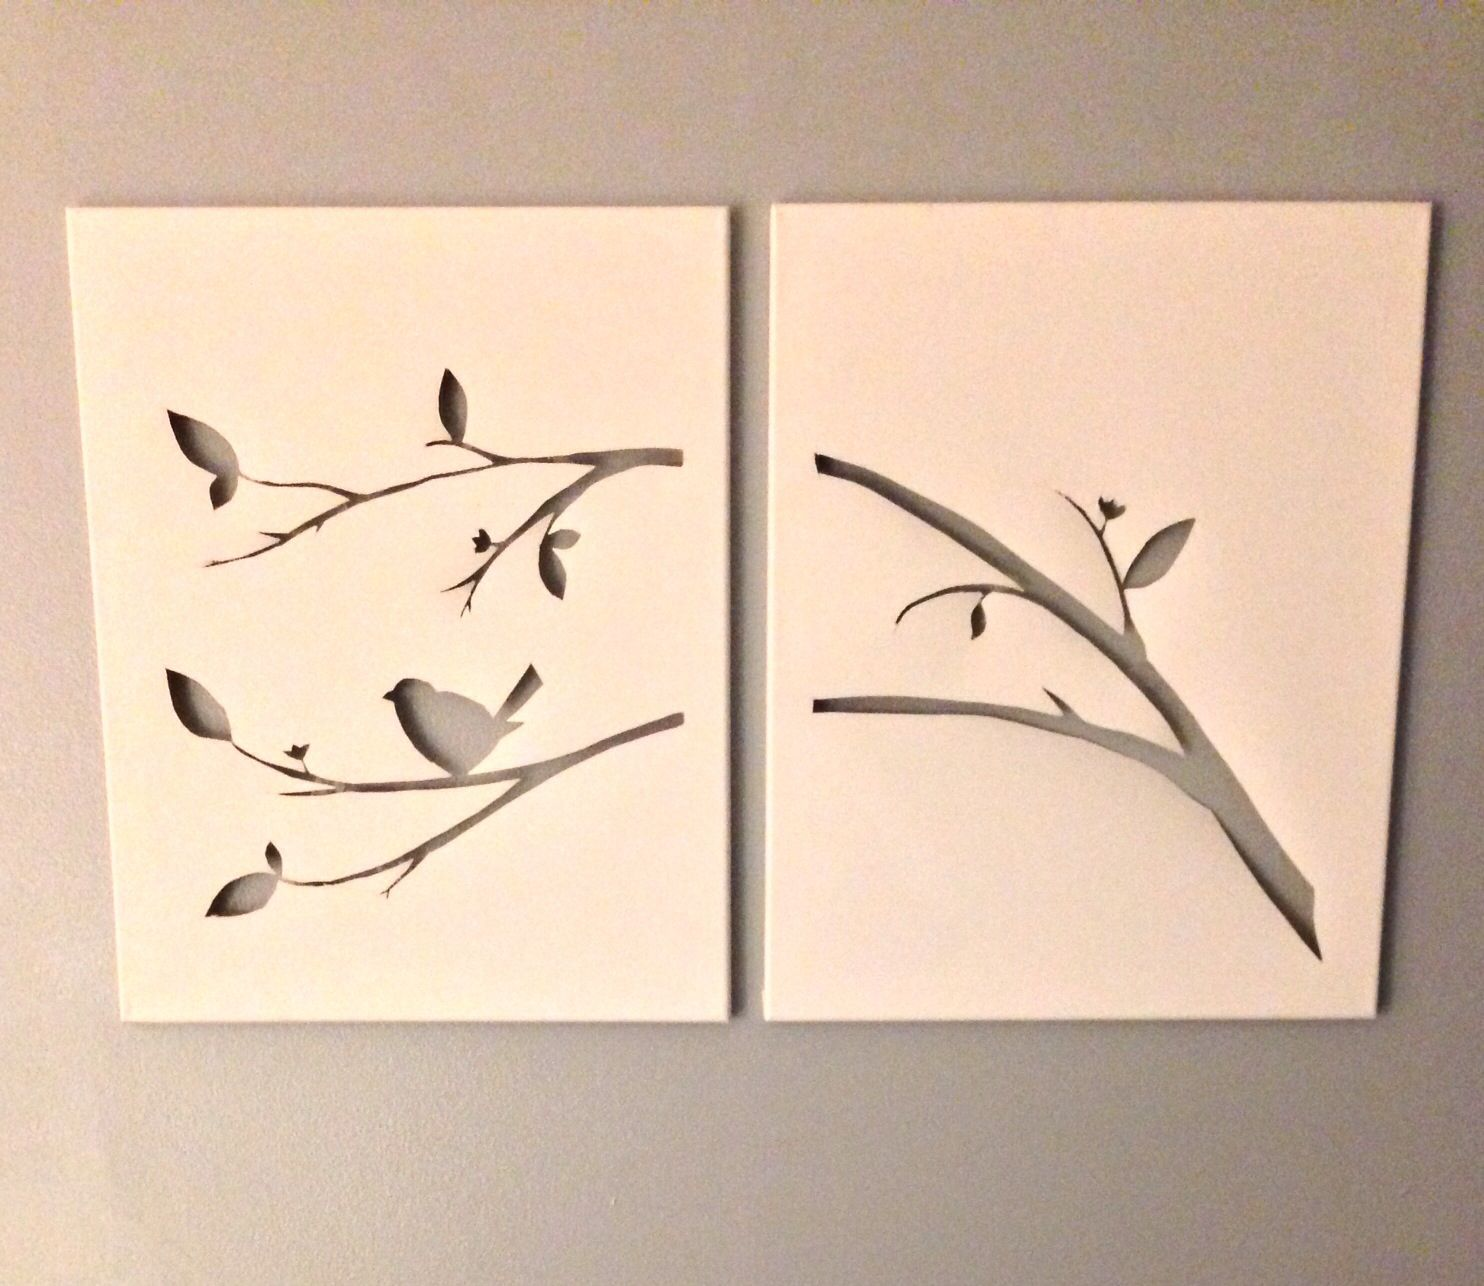 Epingle Par Radhika Sur Crafty Crafts Bricolage Et Loisirs Creatifs Deco Papier Creatif